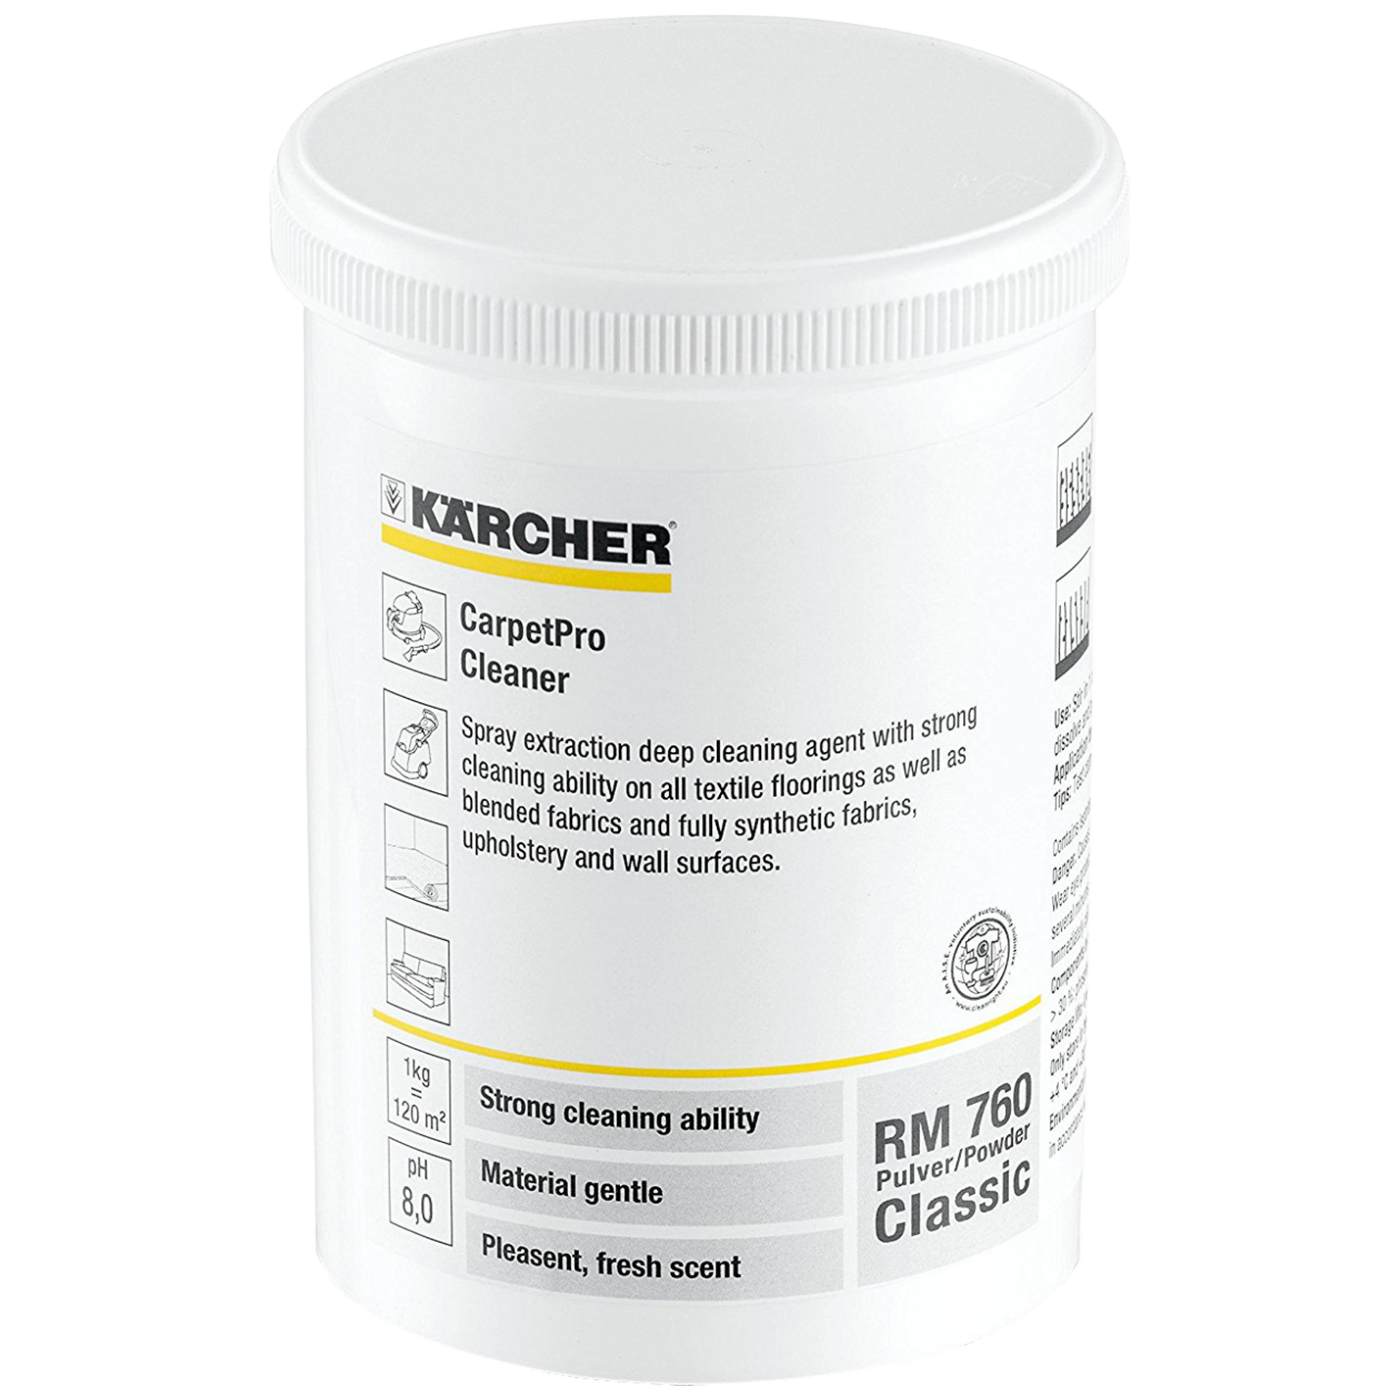 Karcher - RM 760